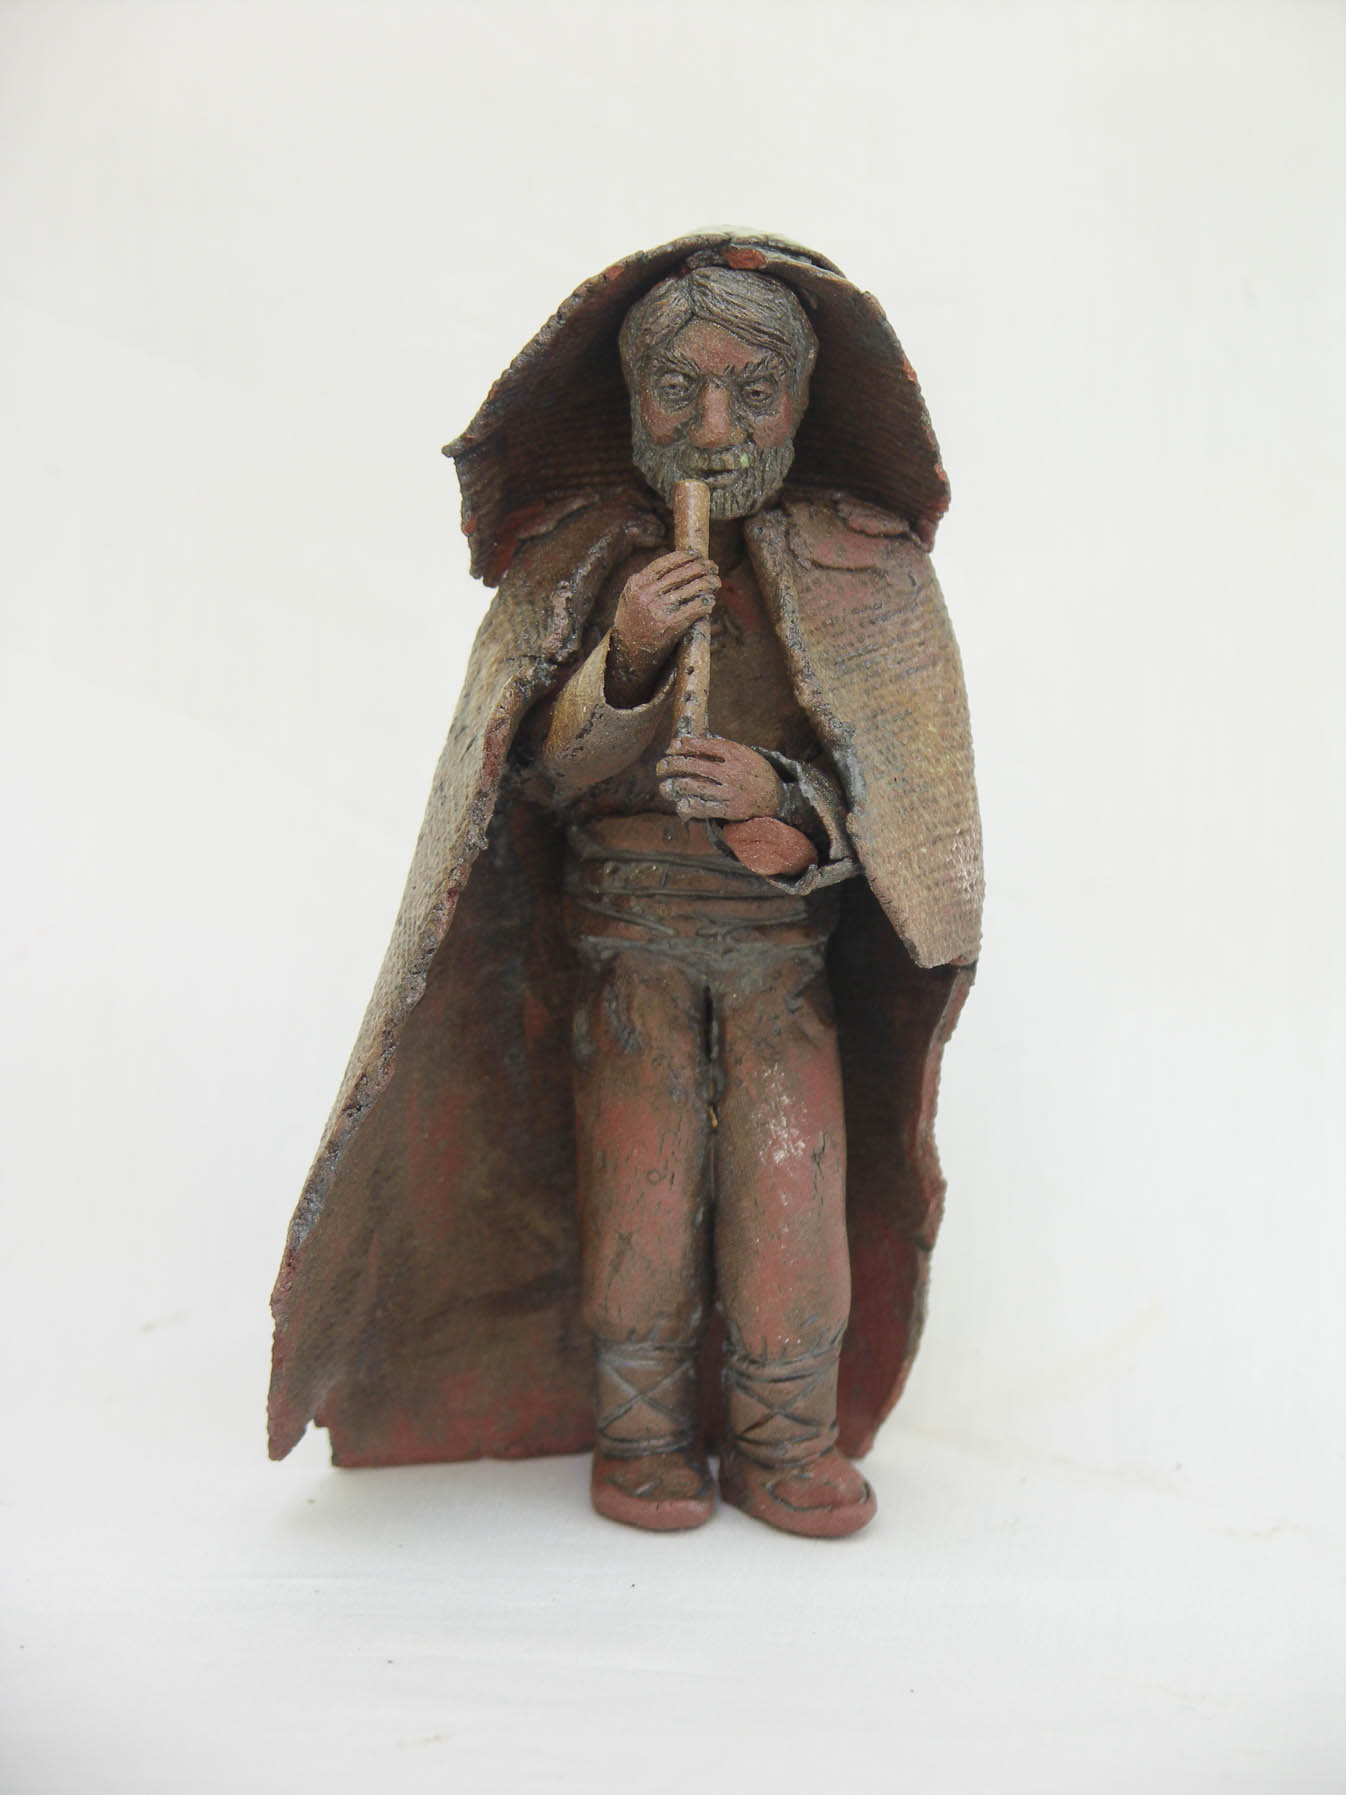 troyan-museum-ralica-yovkova-8